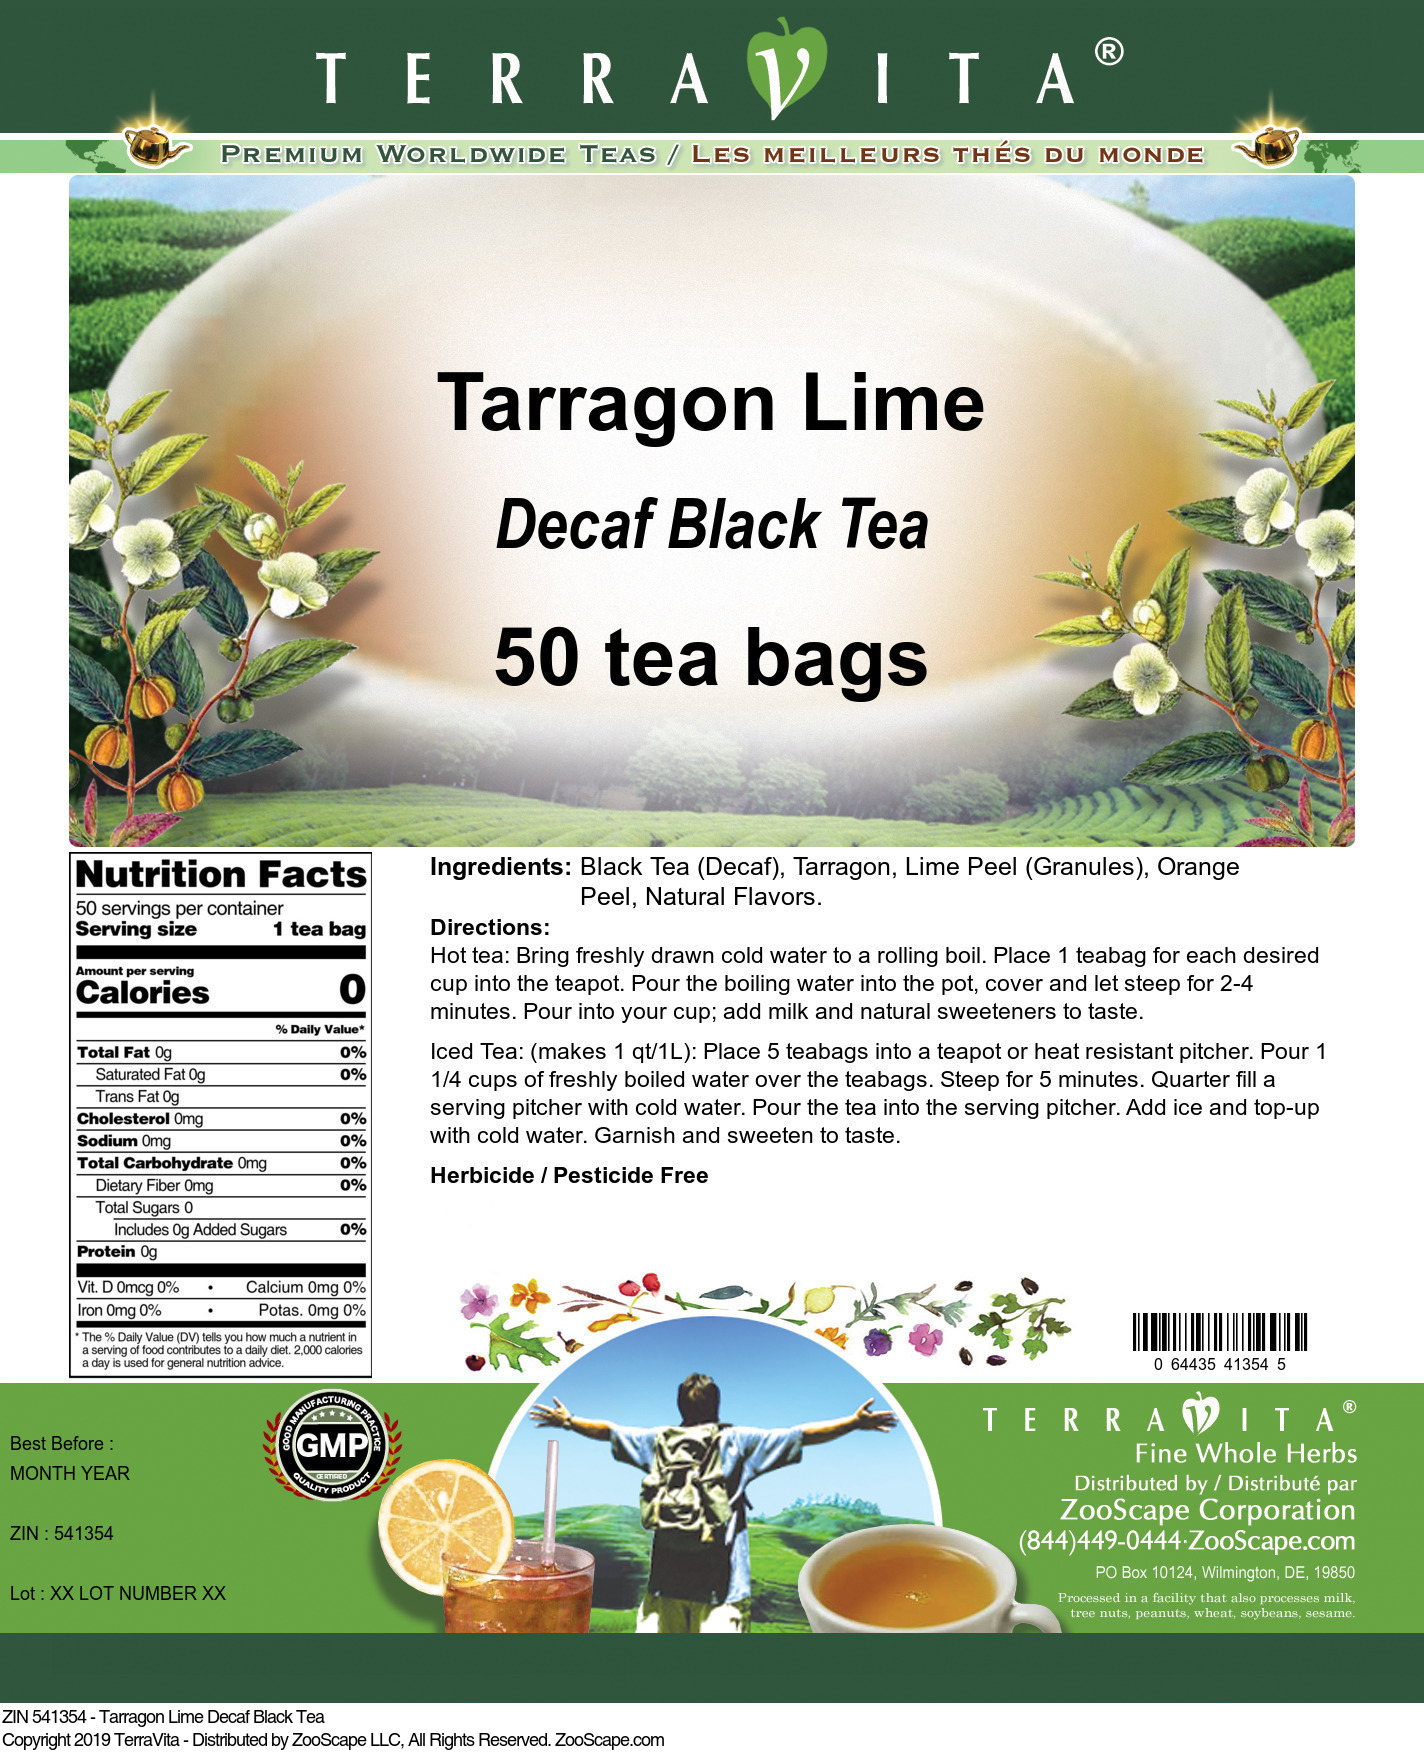 Tarragon Lime Decaf Black Tea